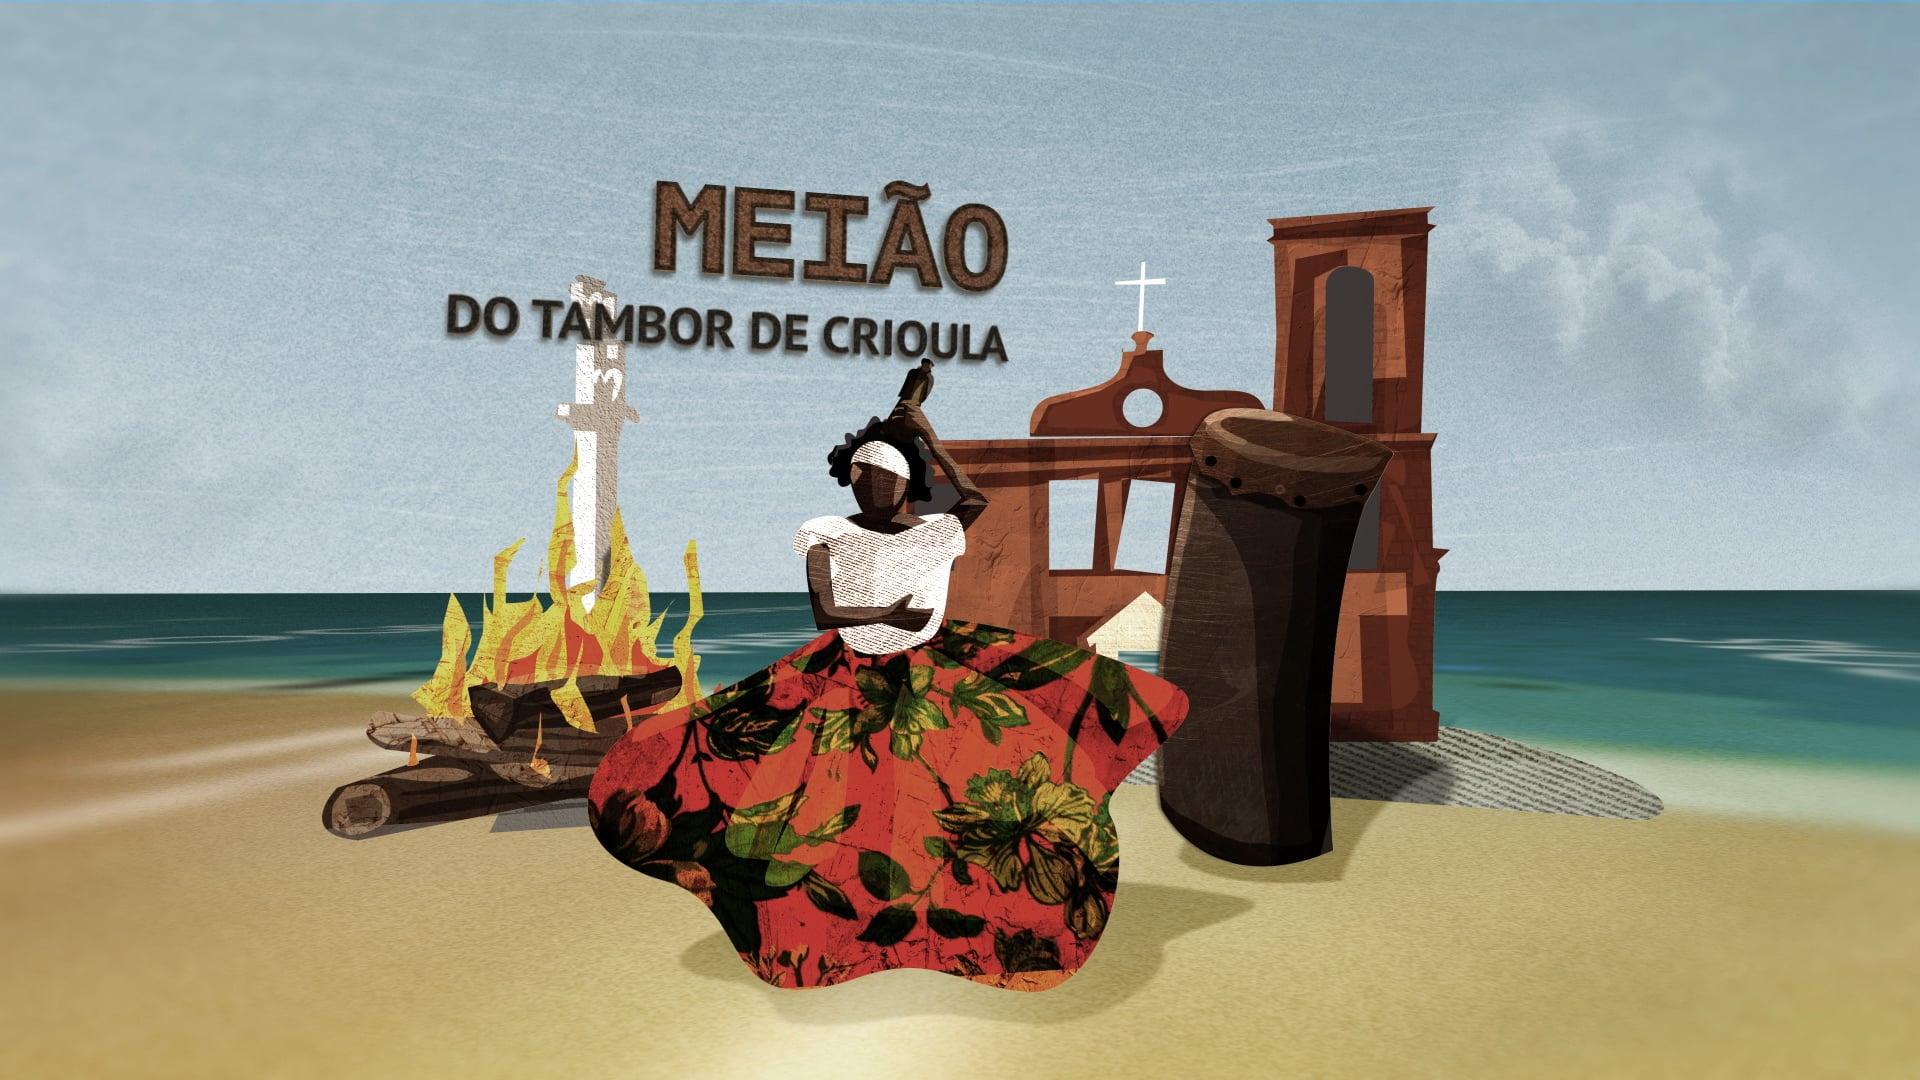 Taquaras 2 - Ep01 - Meião (Teaser)